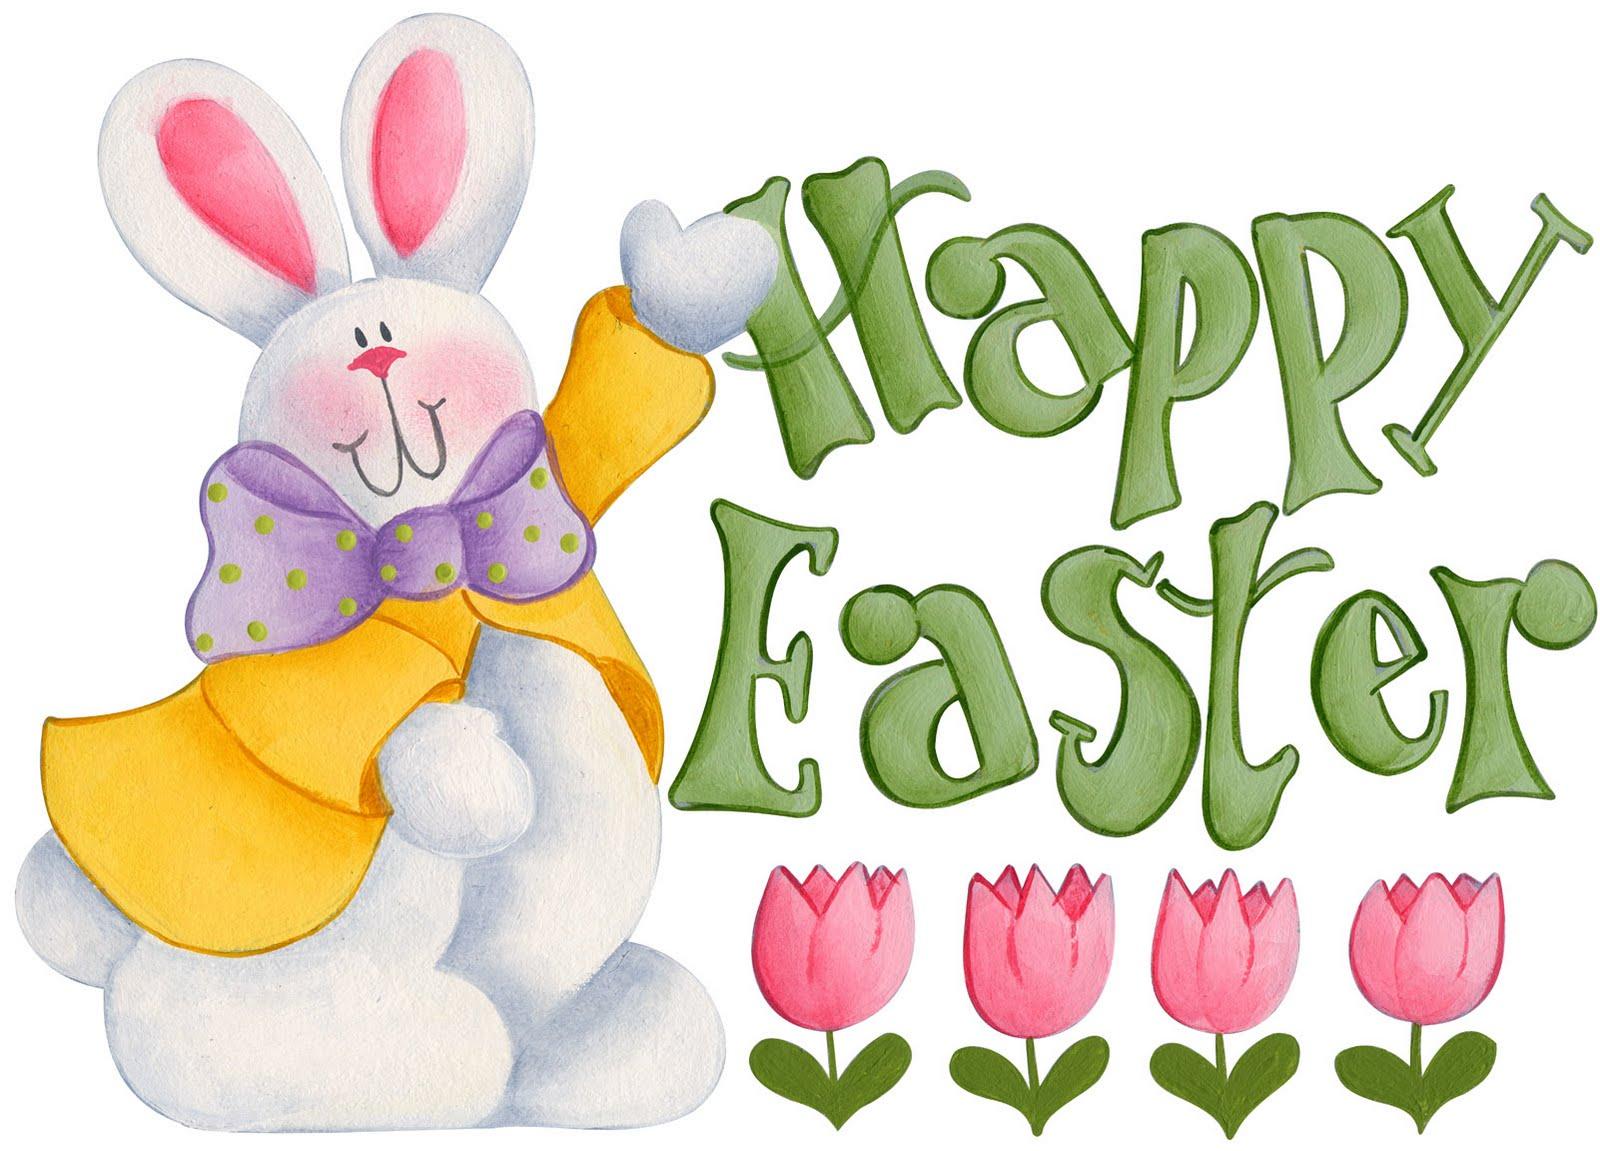 Funny Wallpaper Desktop: Easter Bunny Clip Art Pictures Easter Clip Art Free Images